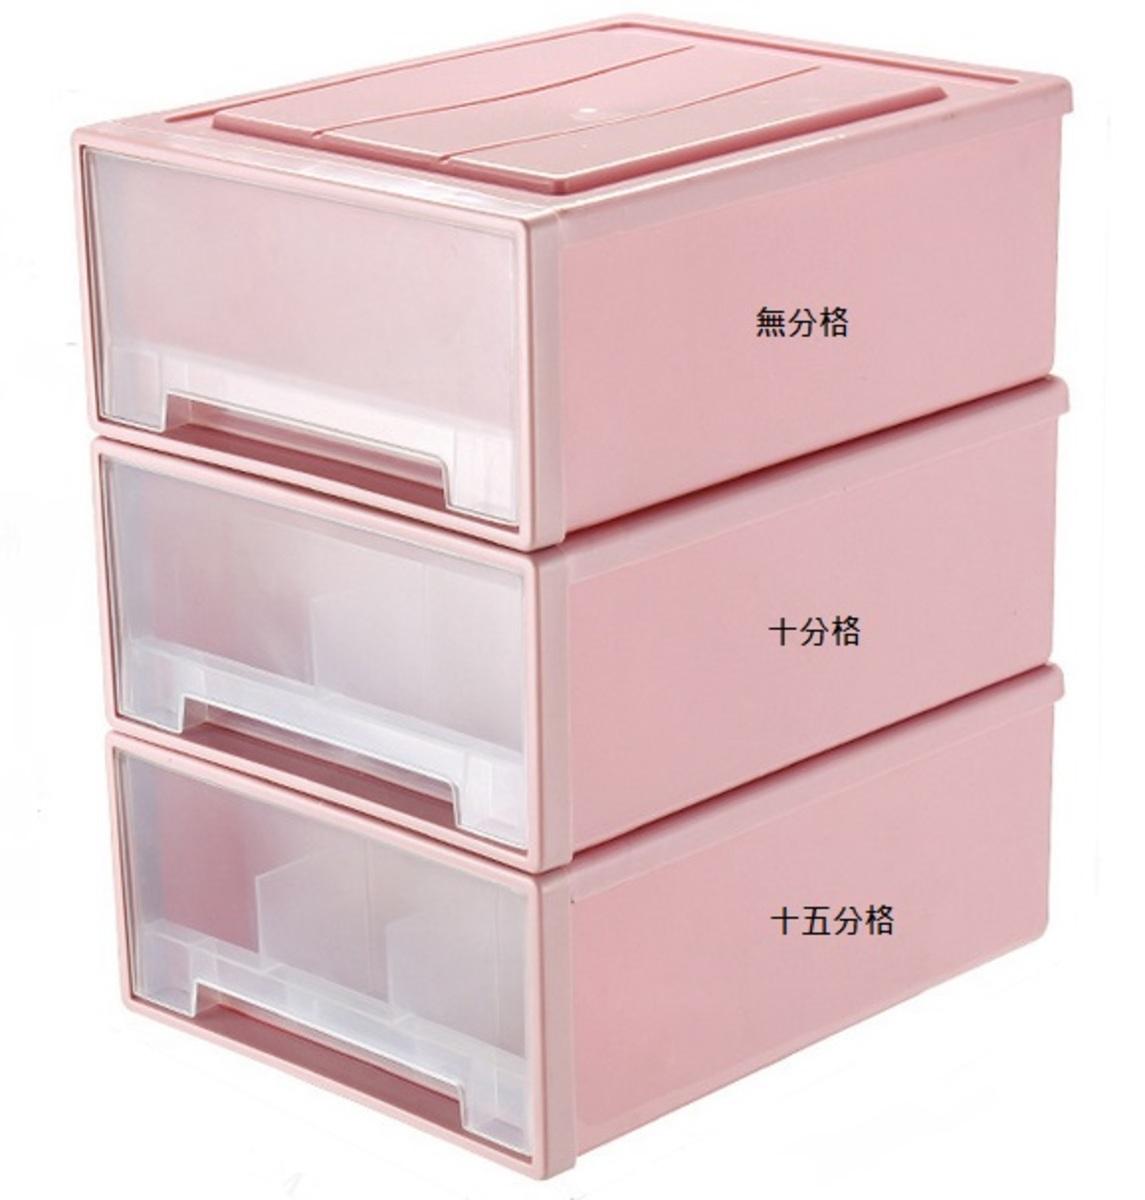 Multi-purpose underwear storage box (three packs) - pink (JG12-PK)